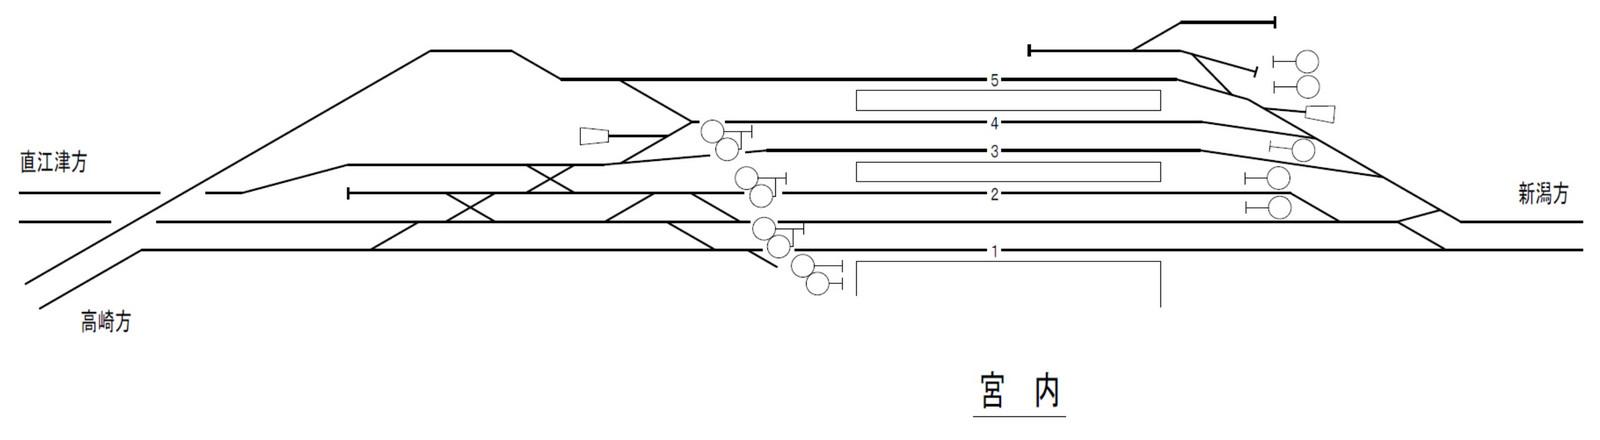 19790716